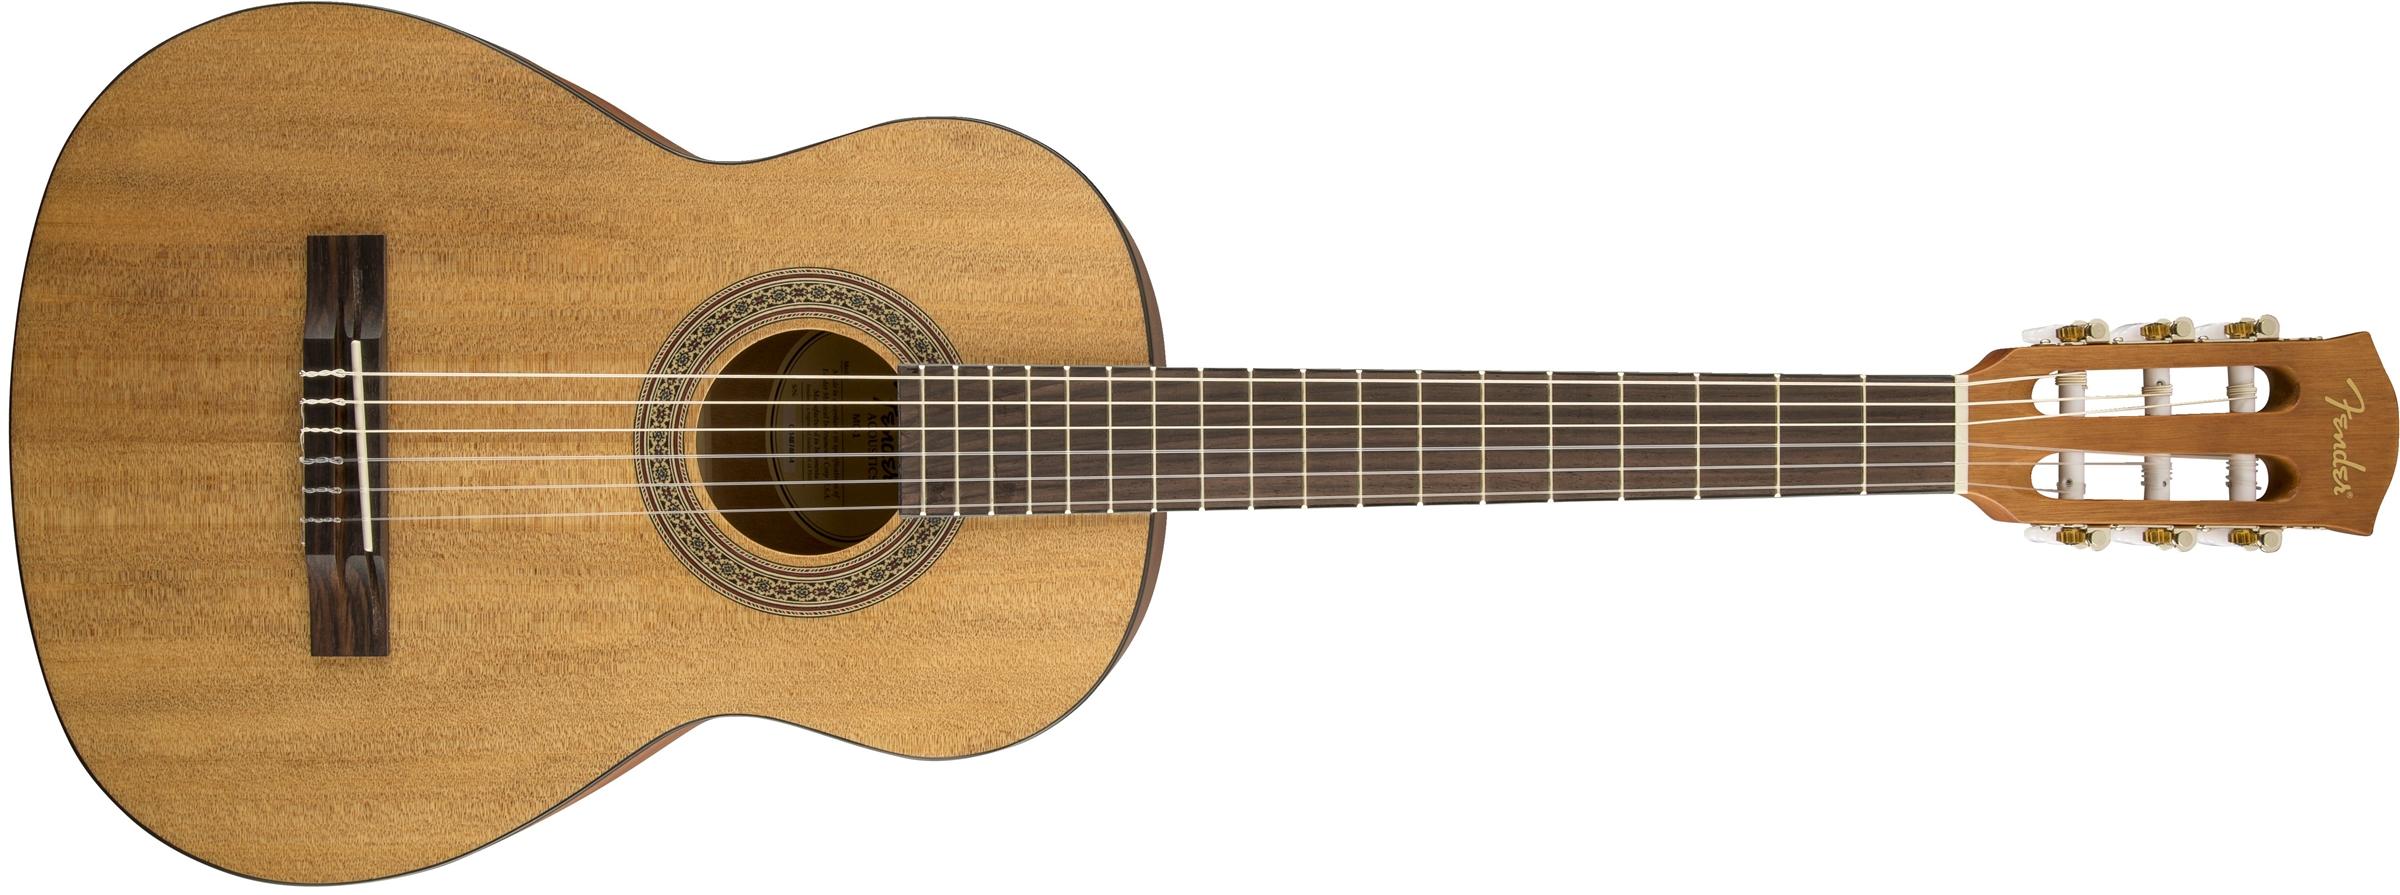 Image of Fender FA-15N Nylon 3/4 Acoustic Guitar with Gig Bag